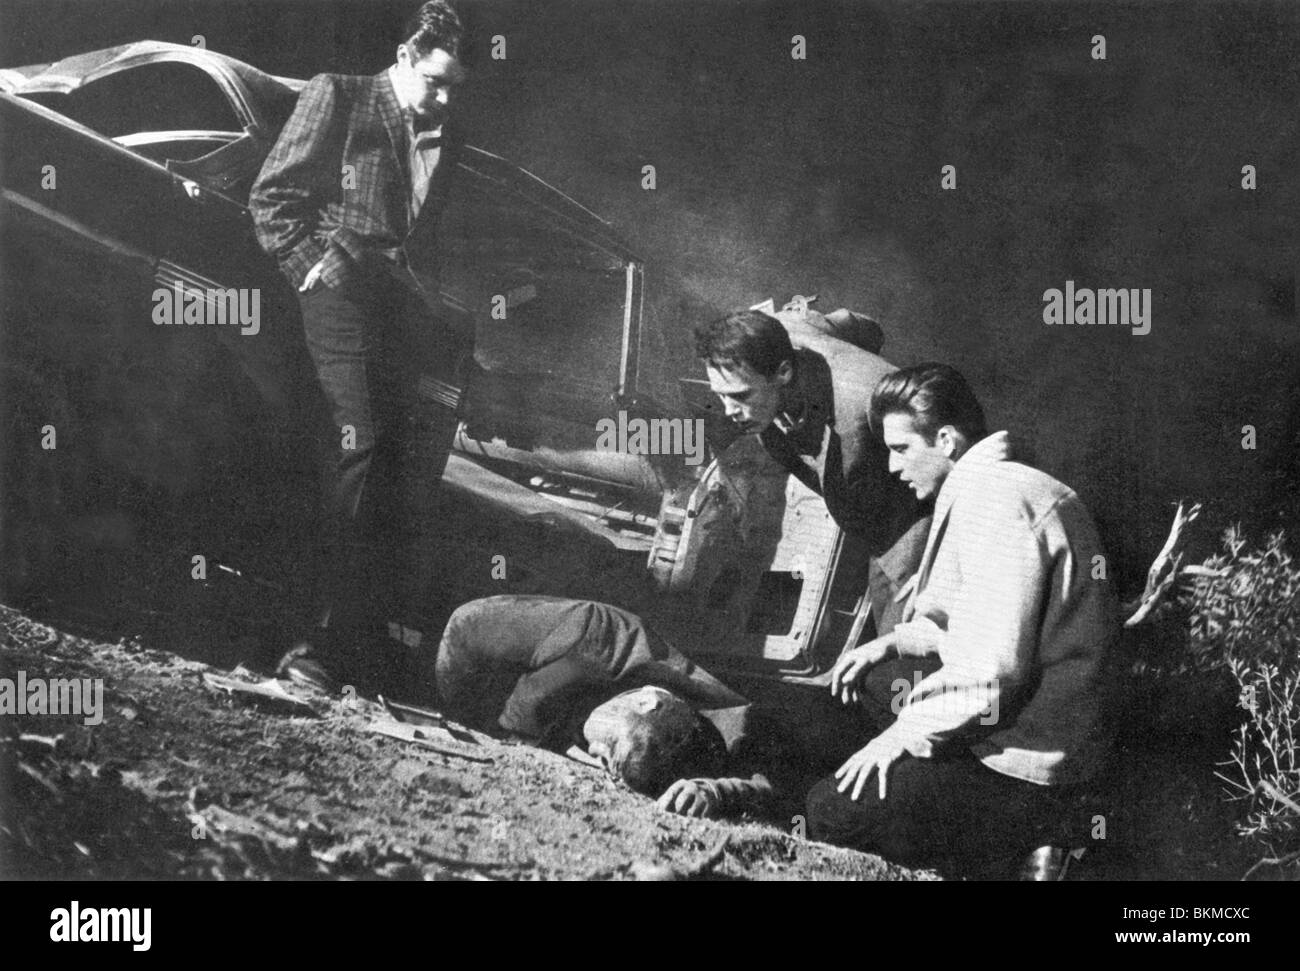 13 WEST STREET -1962 - Stock Image